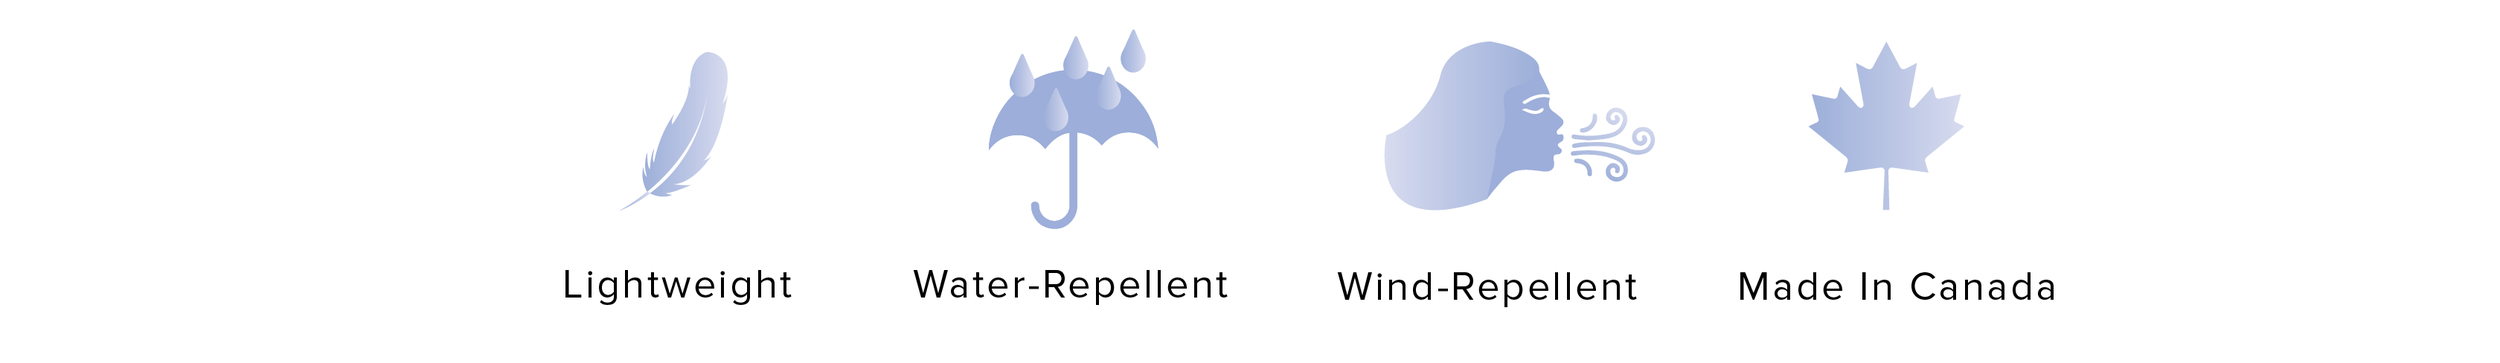 emojis-windwaterlightcanada.png